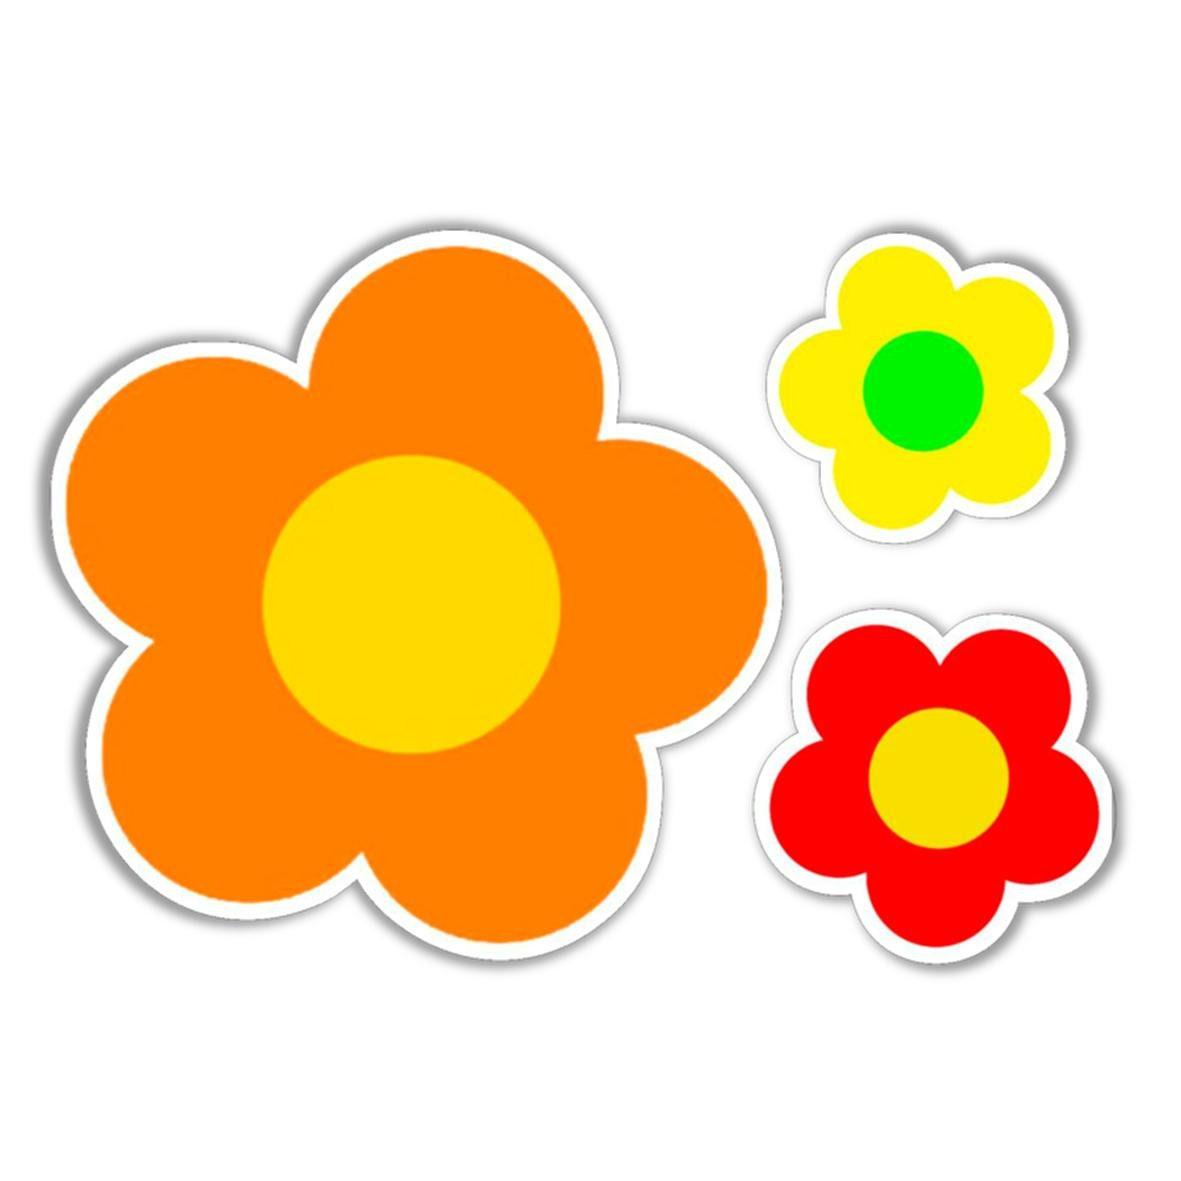 Orange,red,yellow. Fox Vinyl Sticker 3 1//2 in by 2 1//2 in